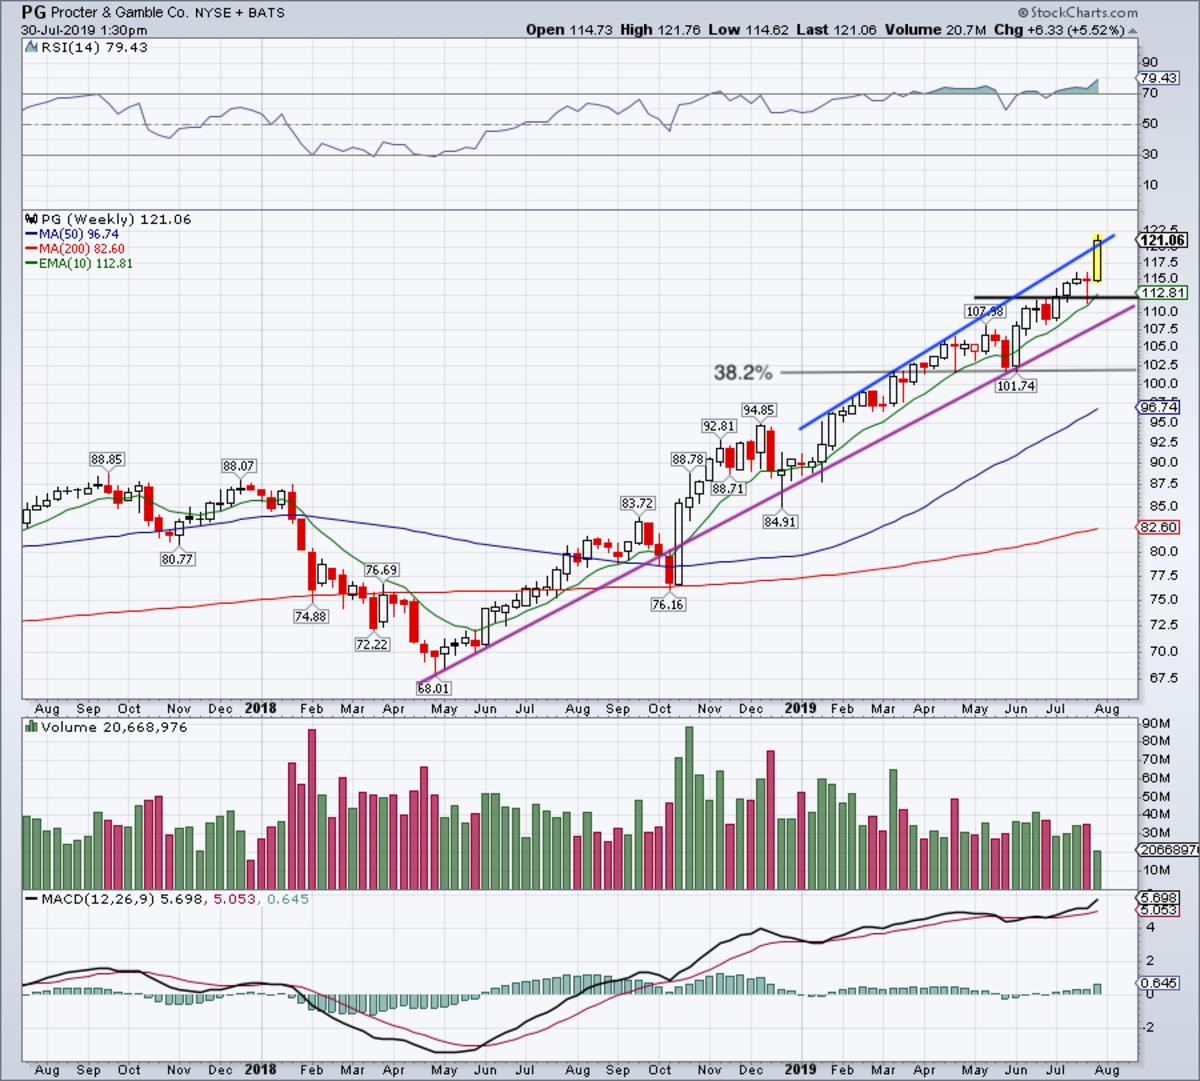 Weekly chart of Procter & Gamble stock.